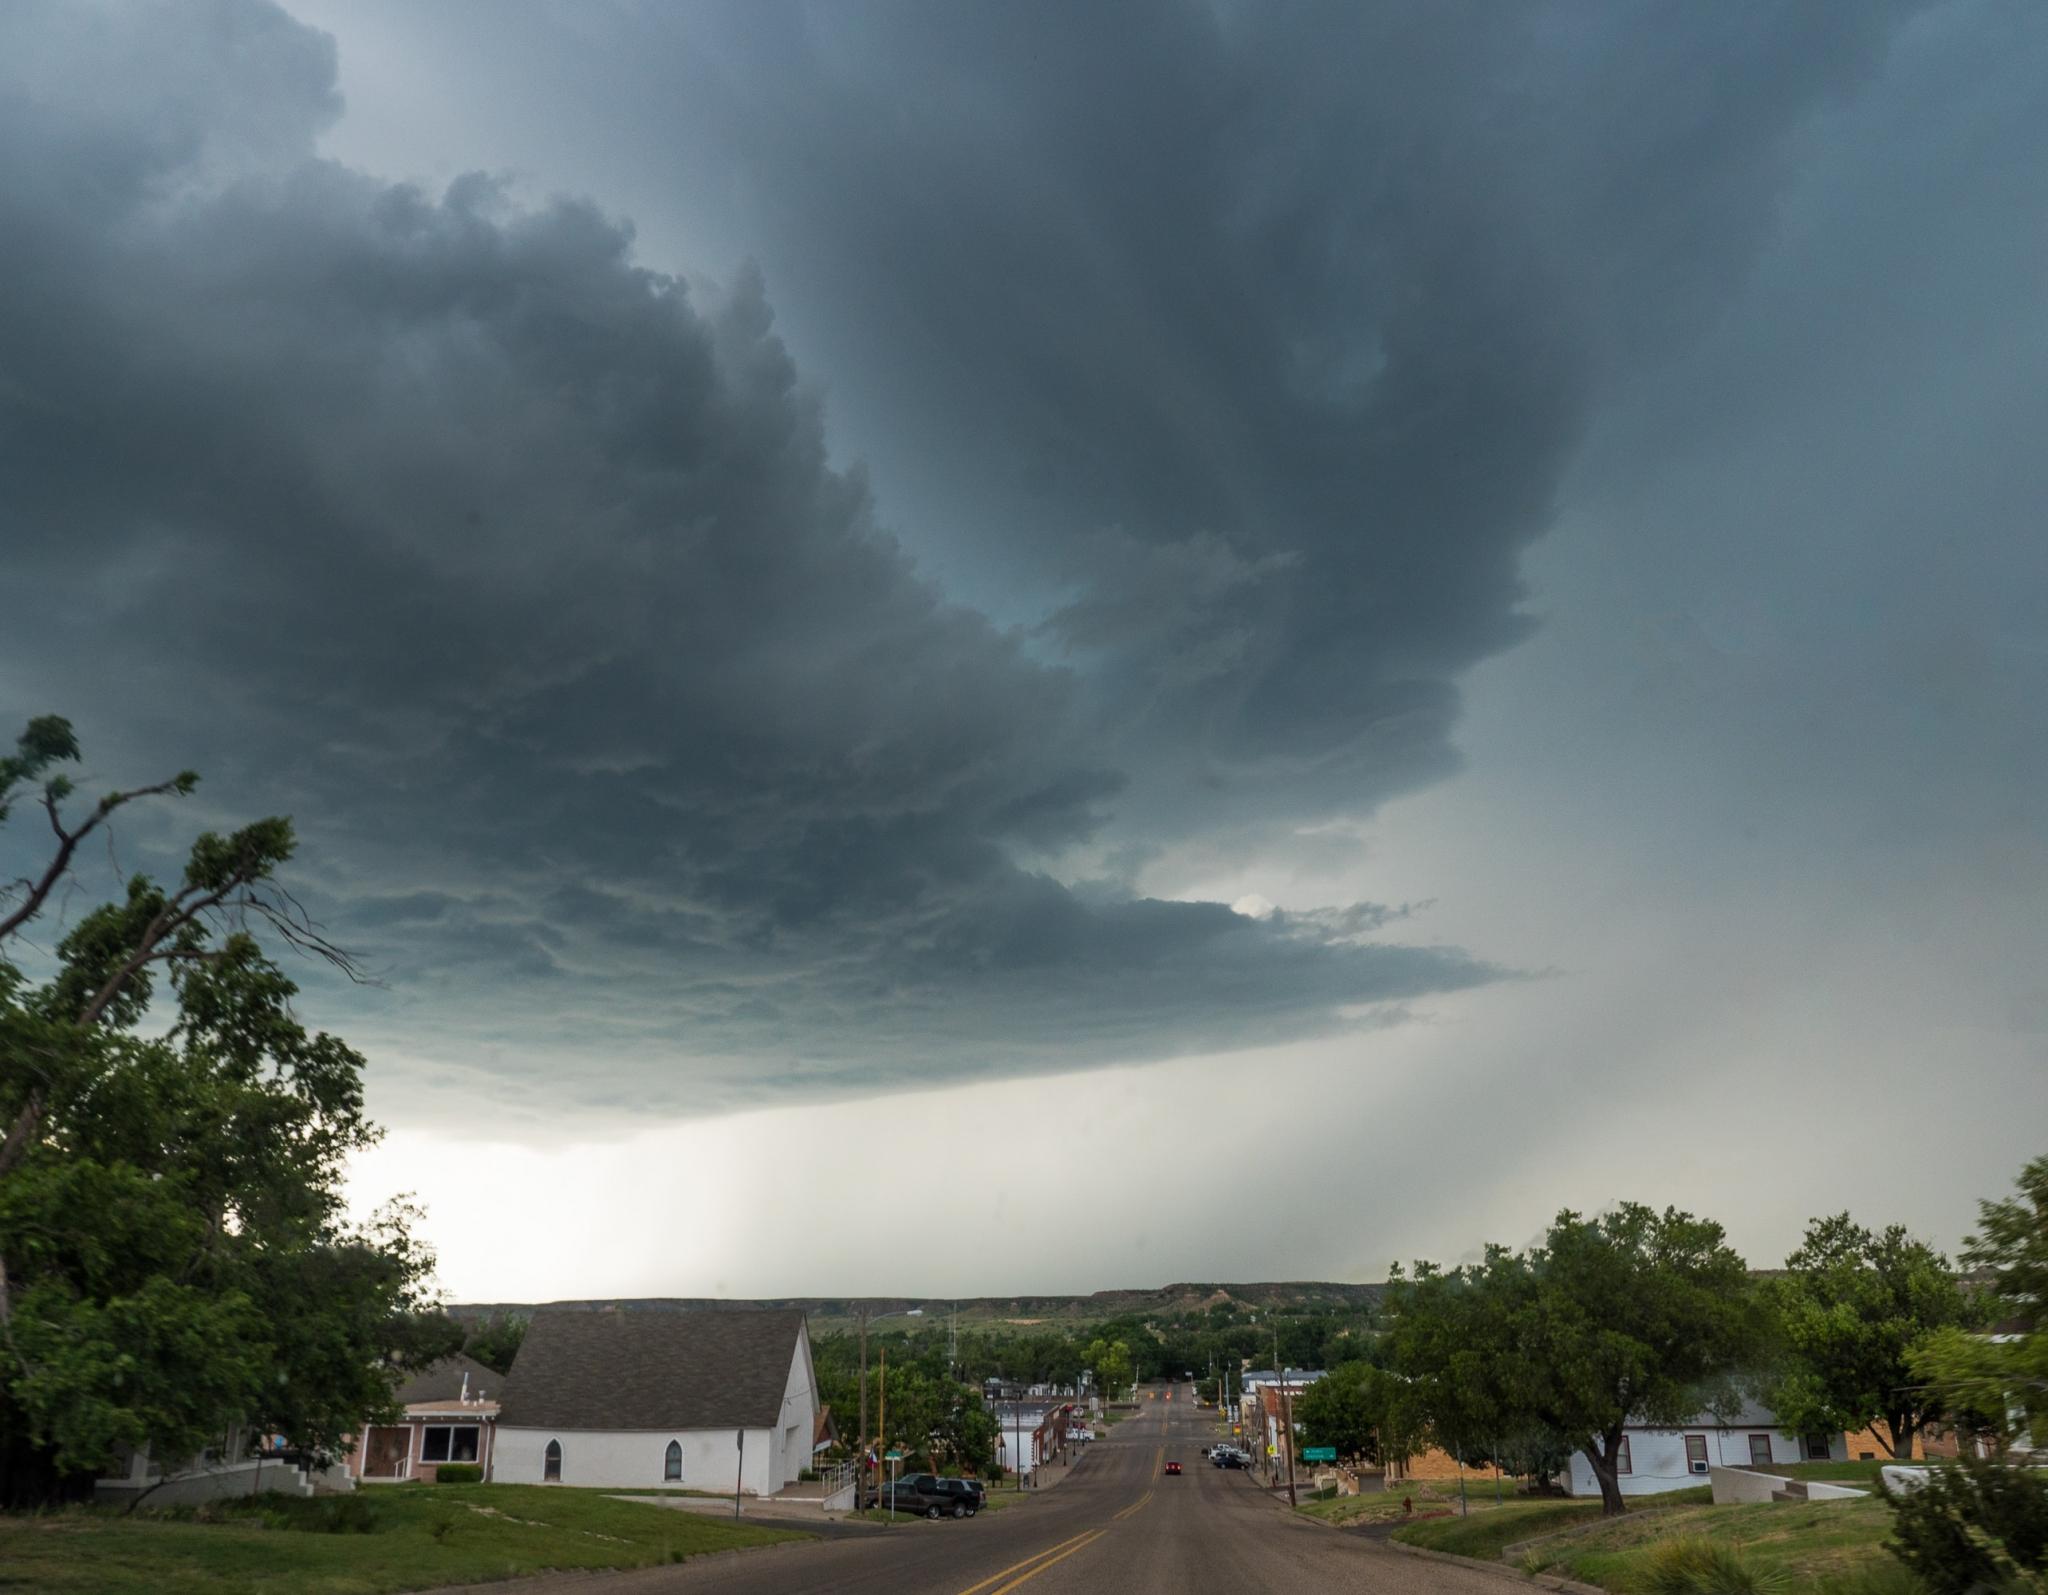 Thunderstorm in Texas